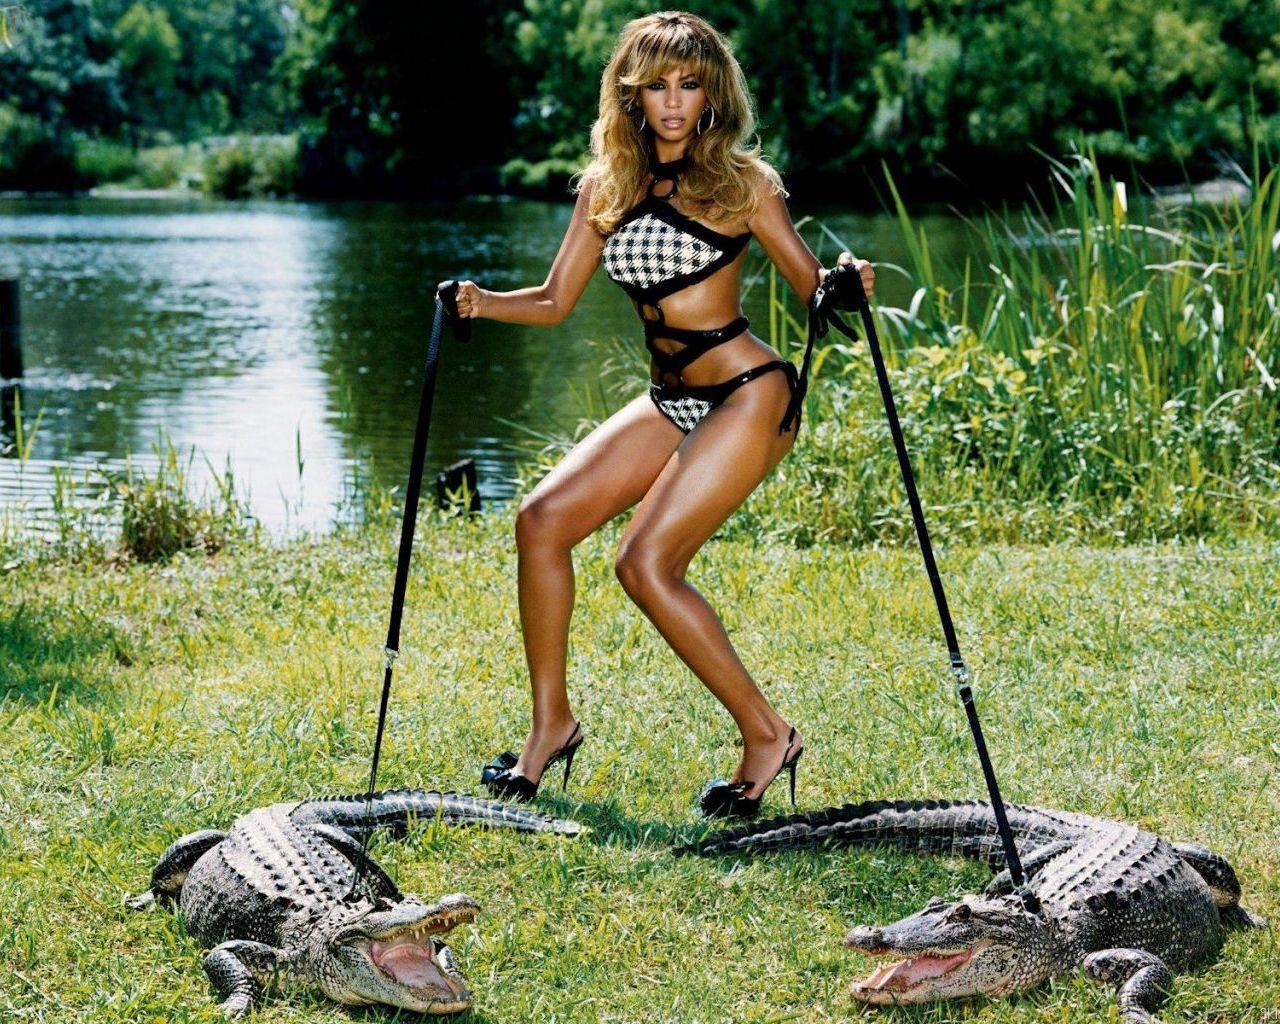 http://4.bp.blogspot.com/-g6KhzU3yUrM/TvcwTz4lH0I/AAAAAAAAHWg/9bXbPk5wS2s/s1600/crocodile-wallpaper-hd-3.jpg